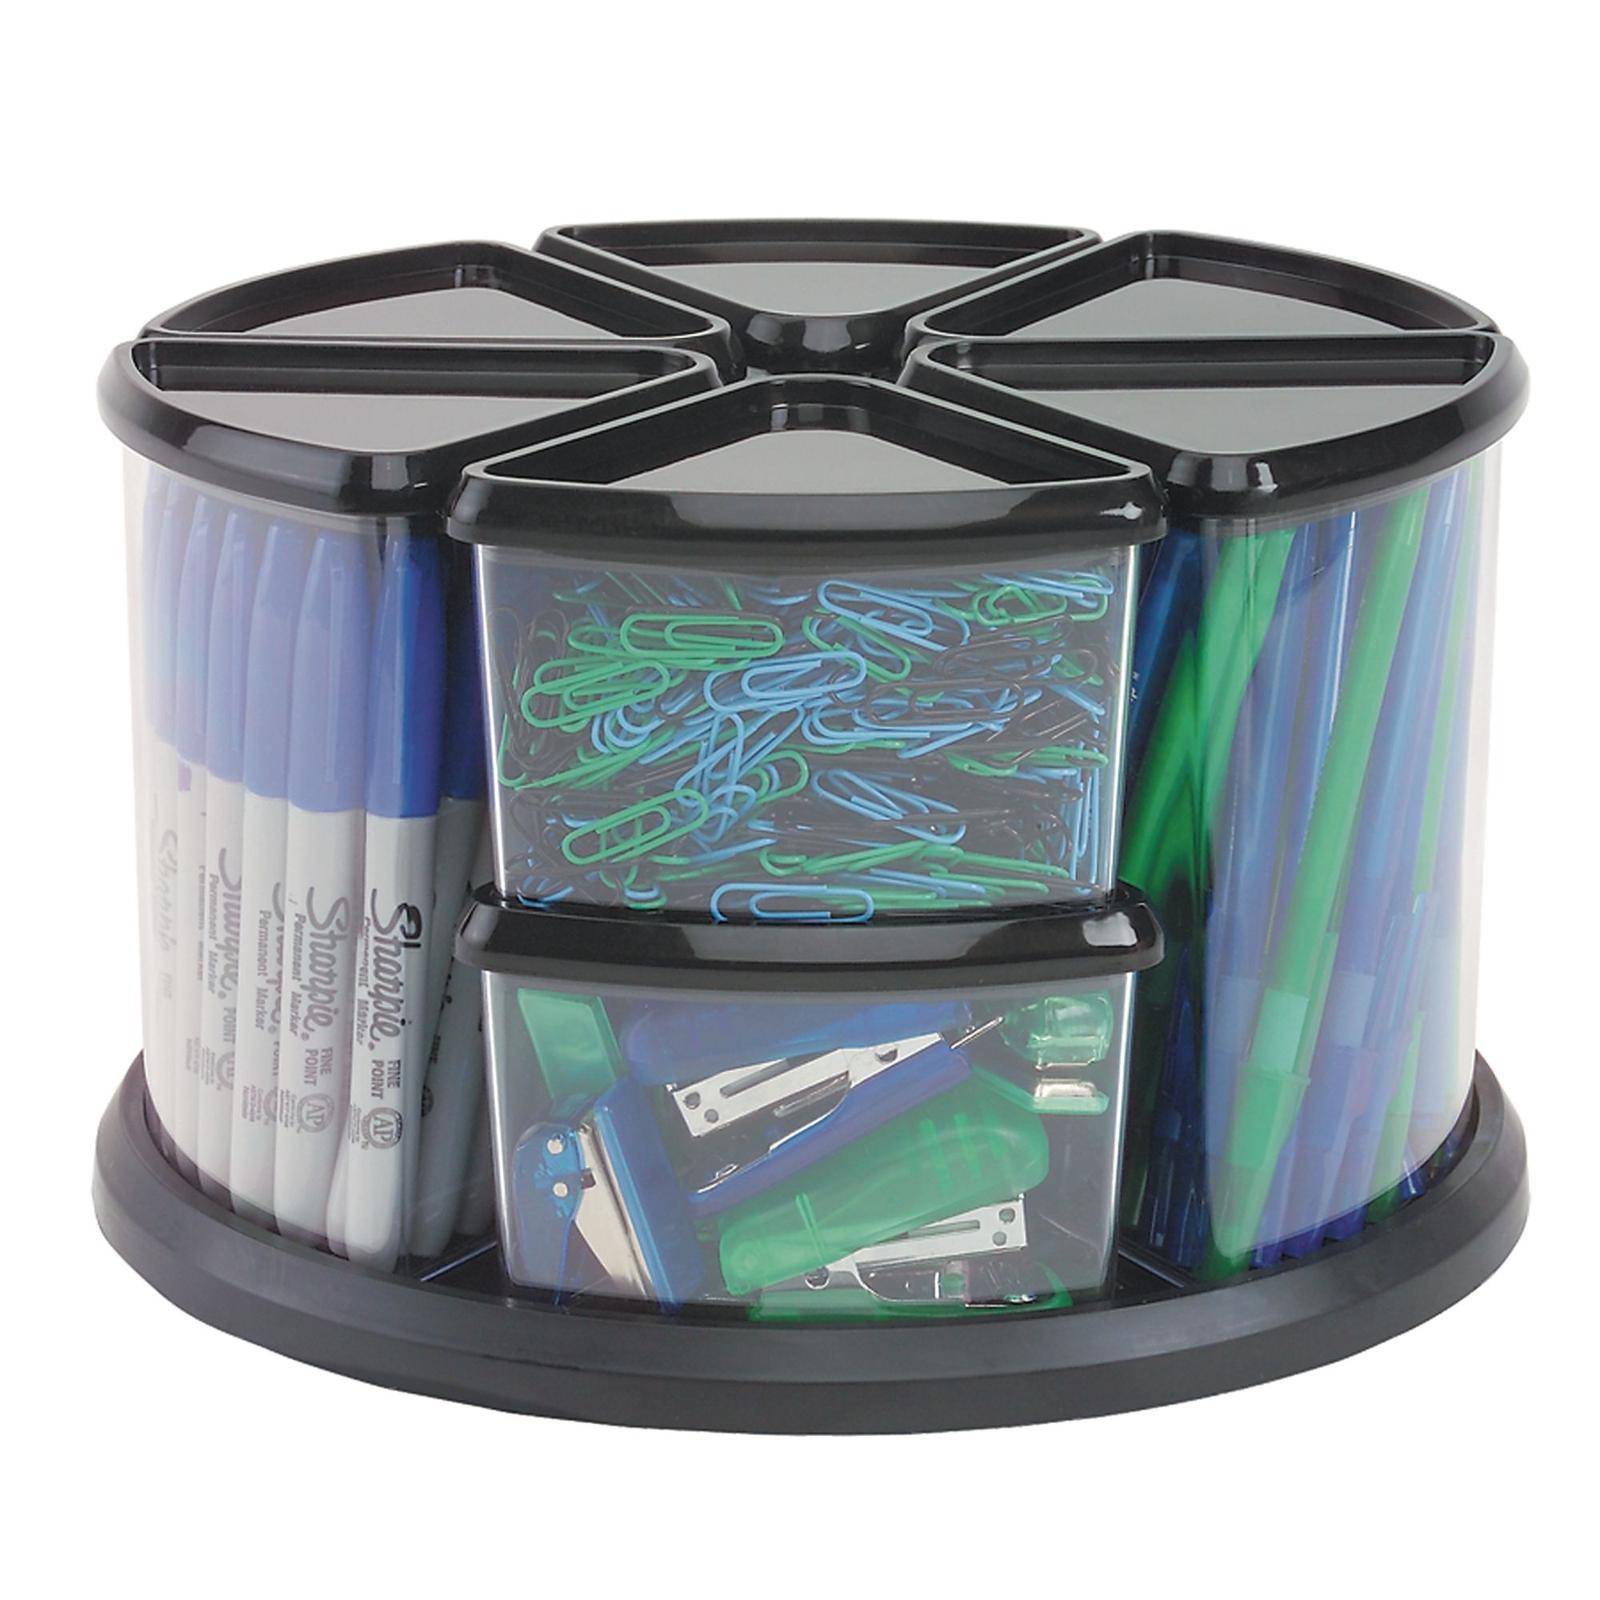 Carousel Storage Tidy - 9 Tubs